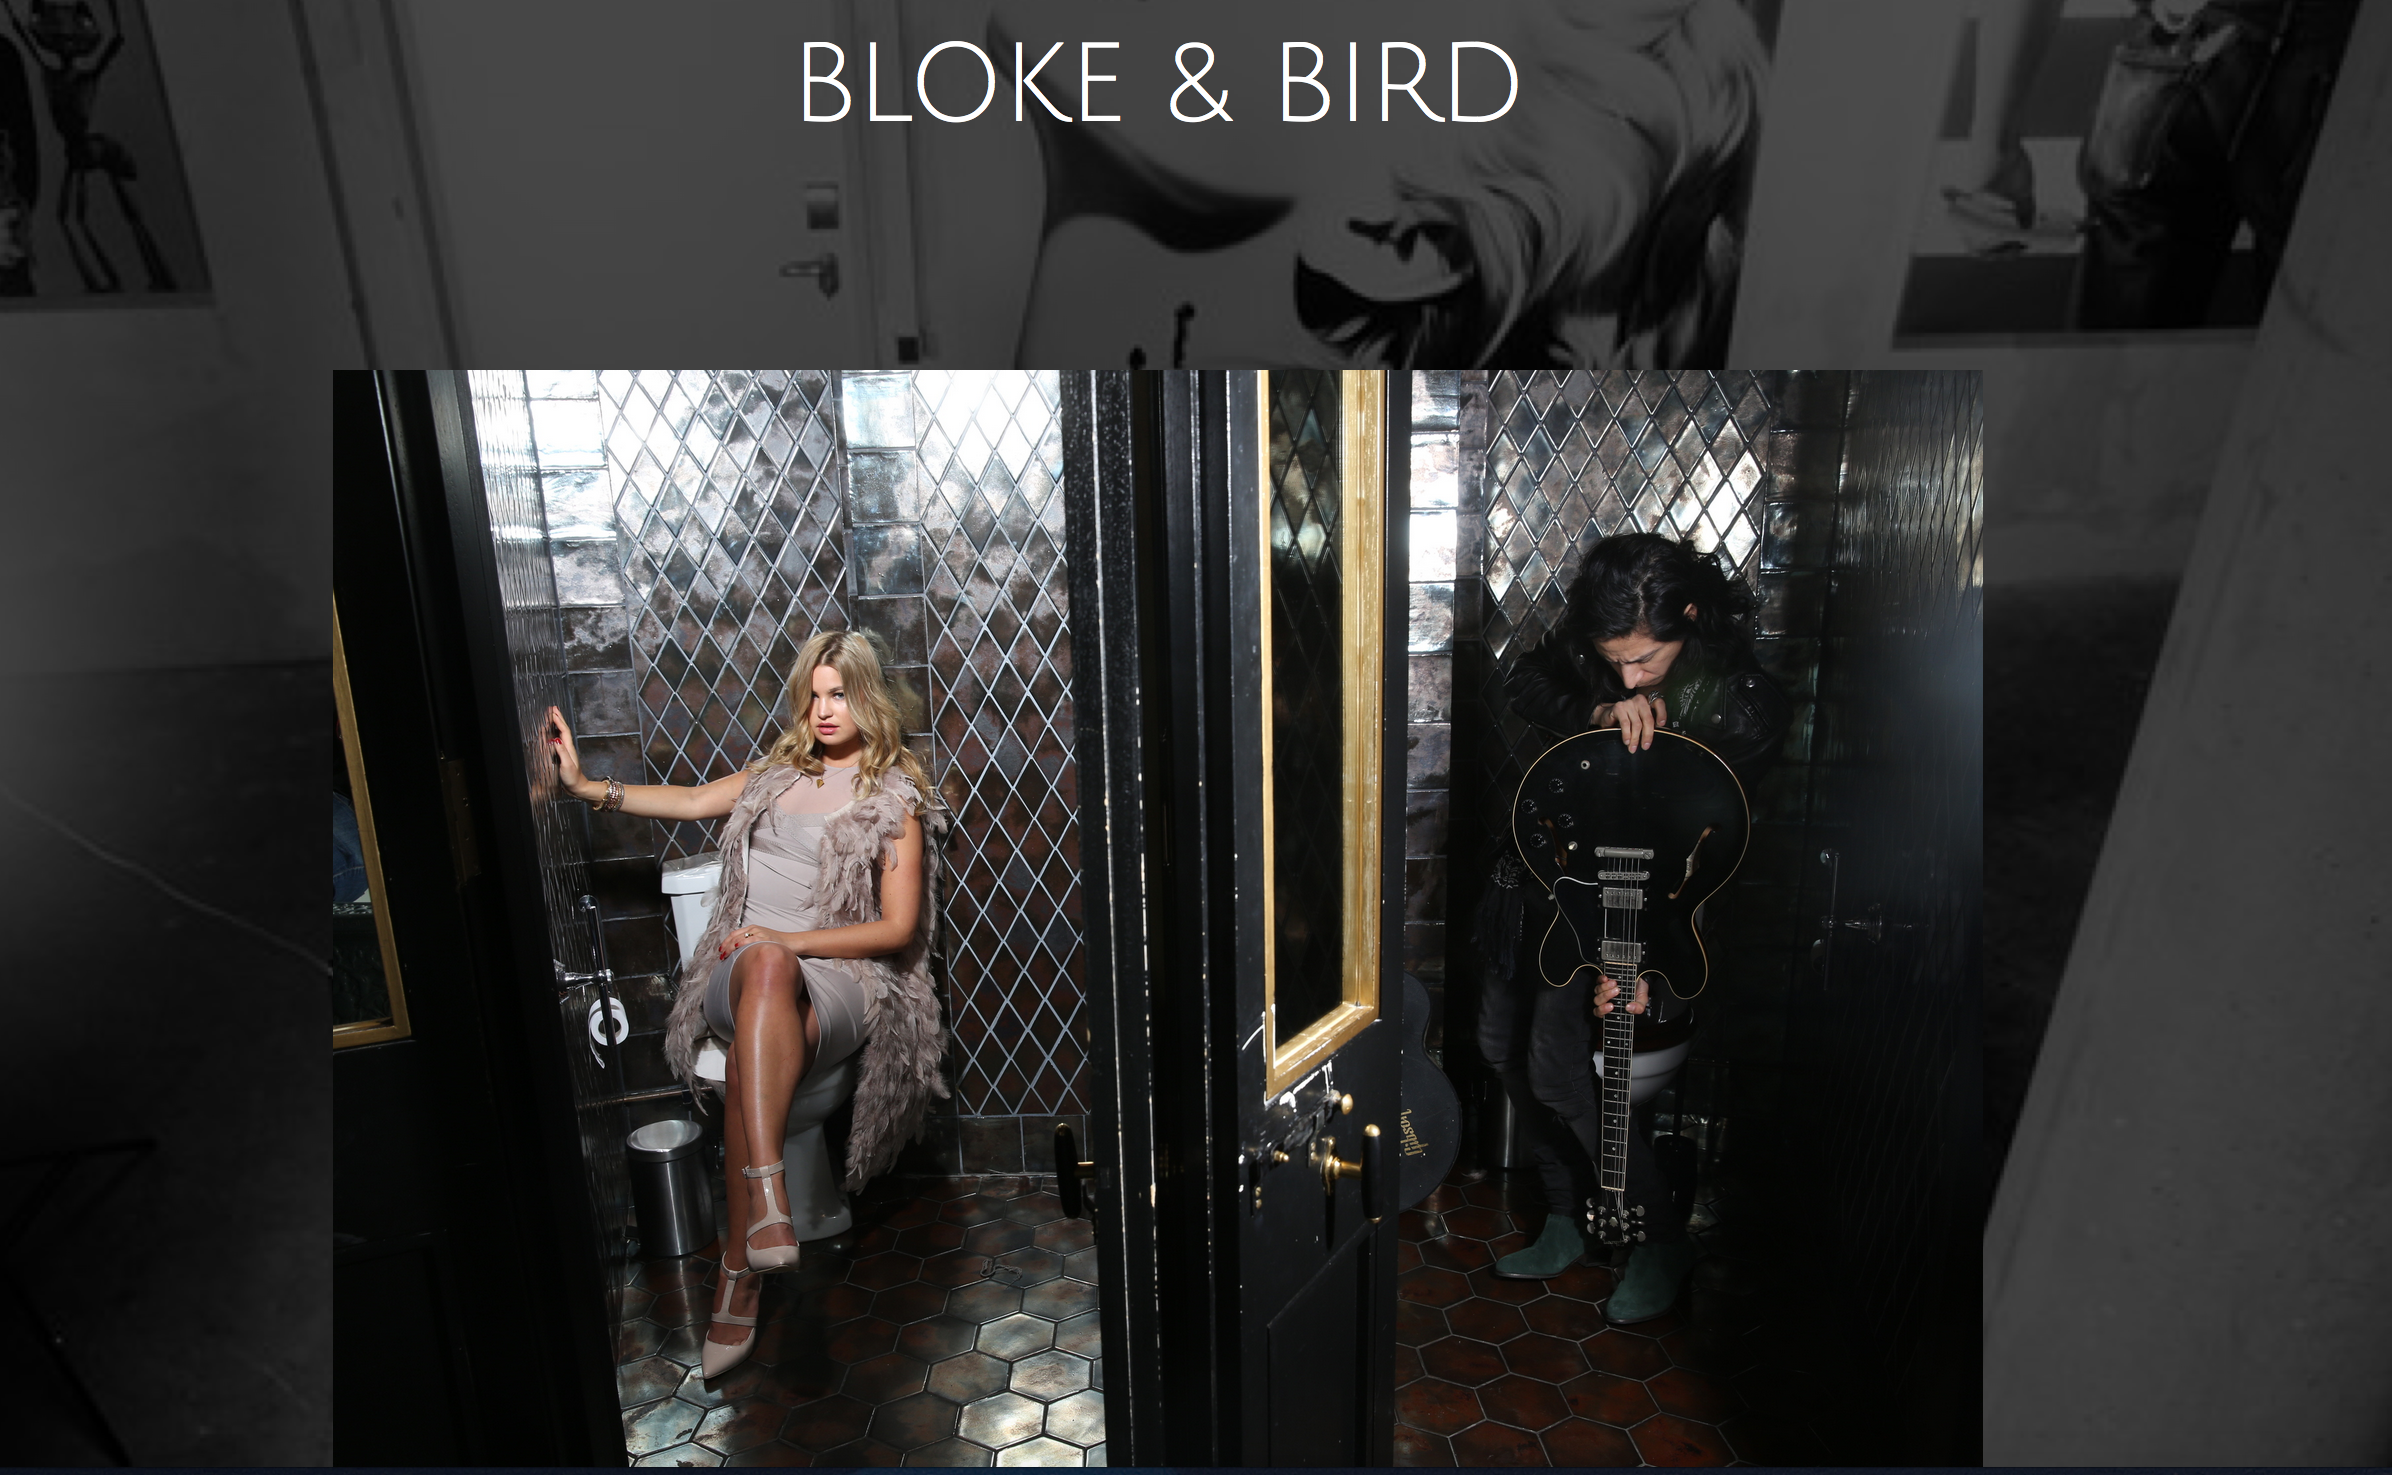 Bloke and Bird, Band